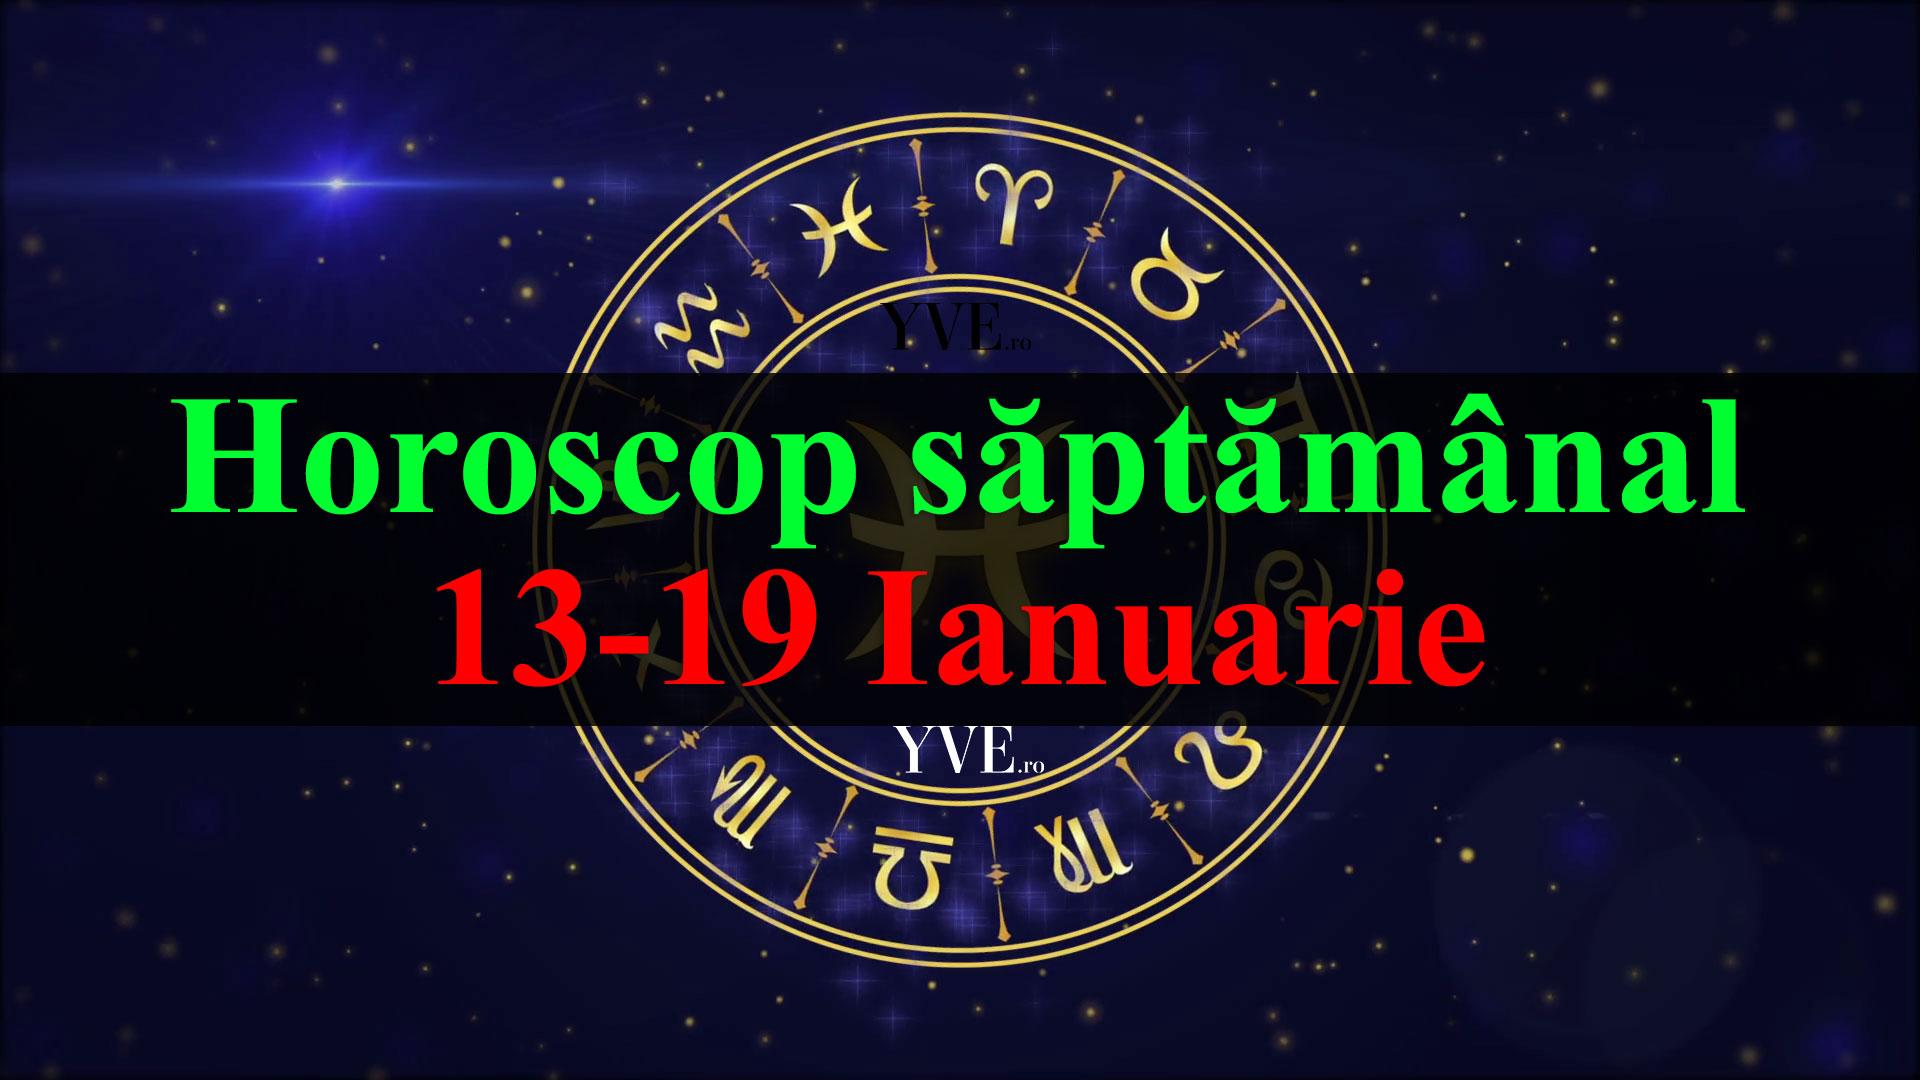 Horoscop saptamanal 13-19 Ianuarie 2020